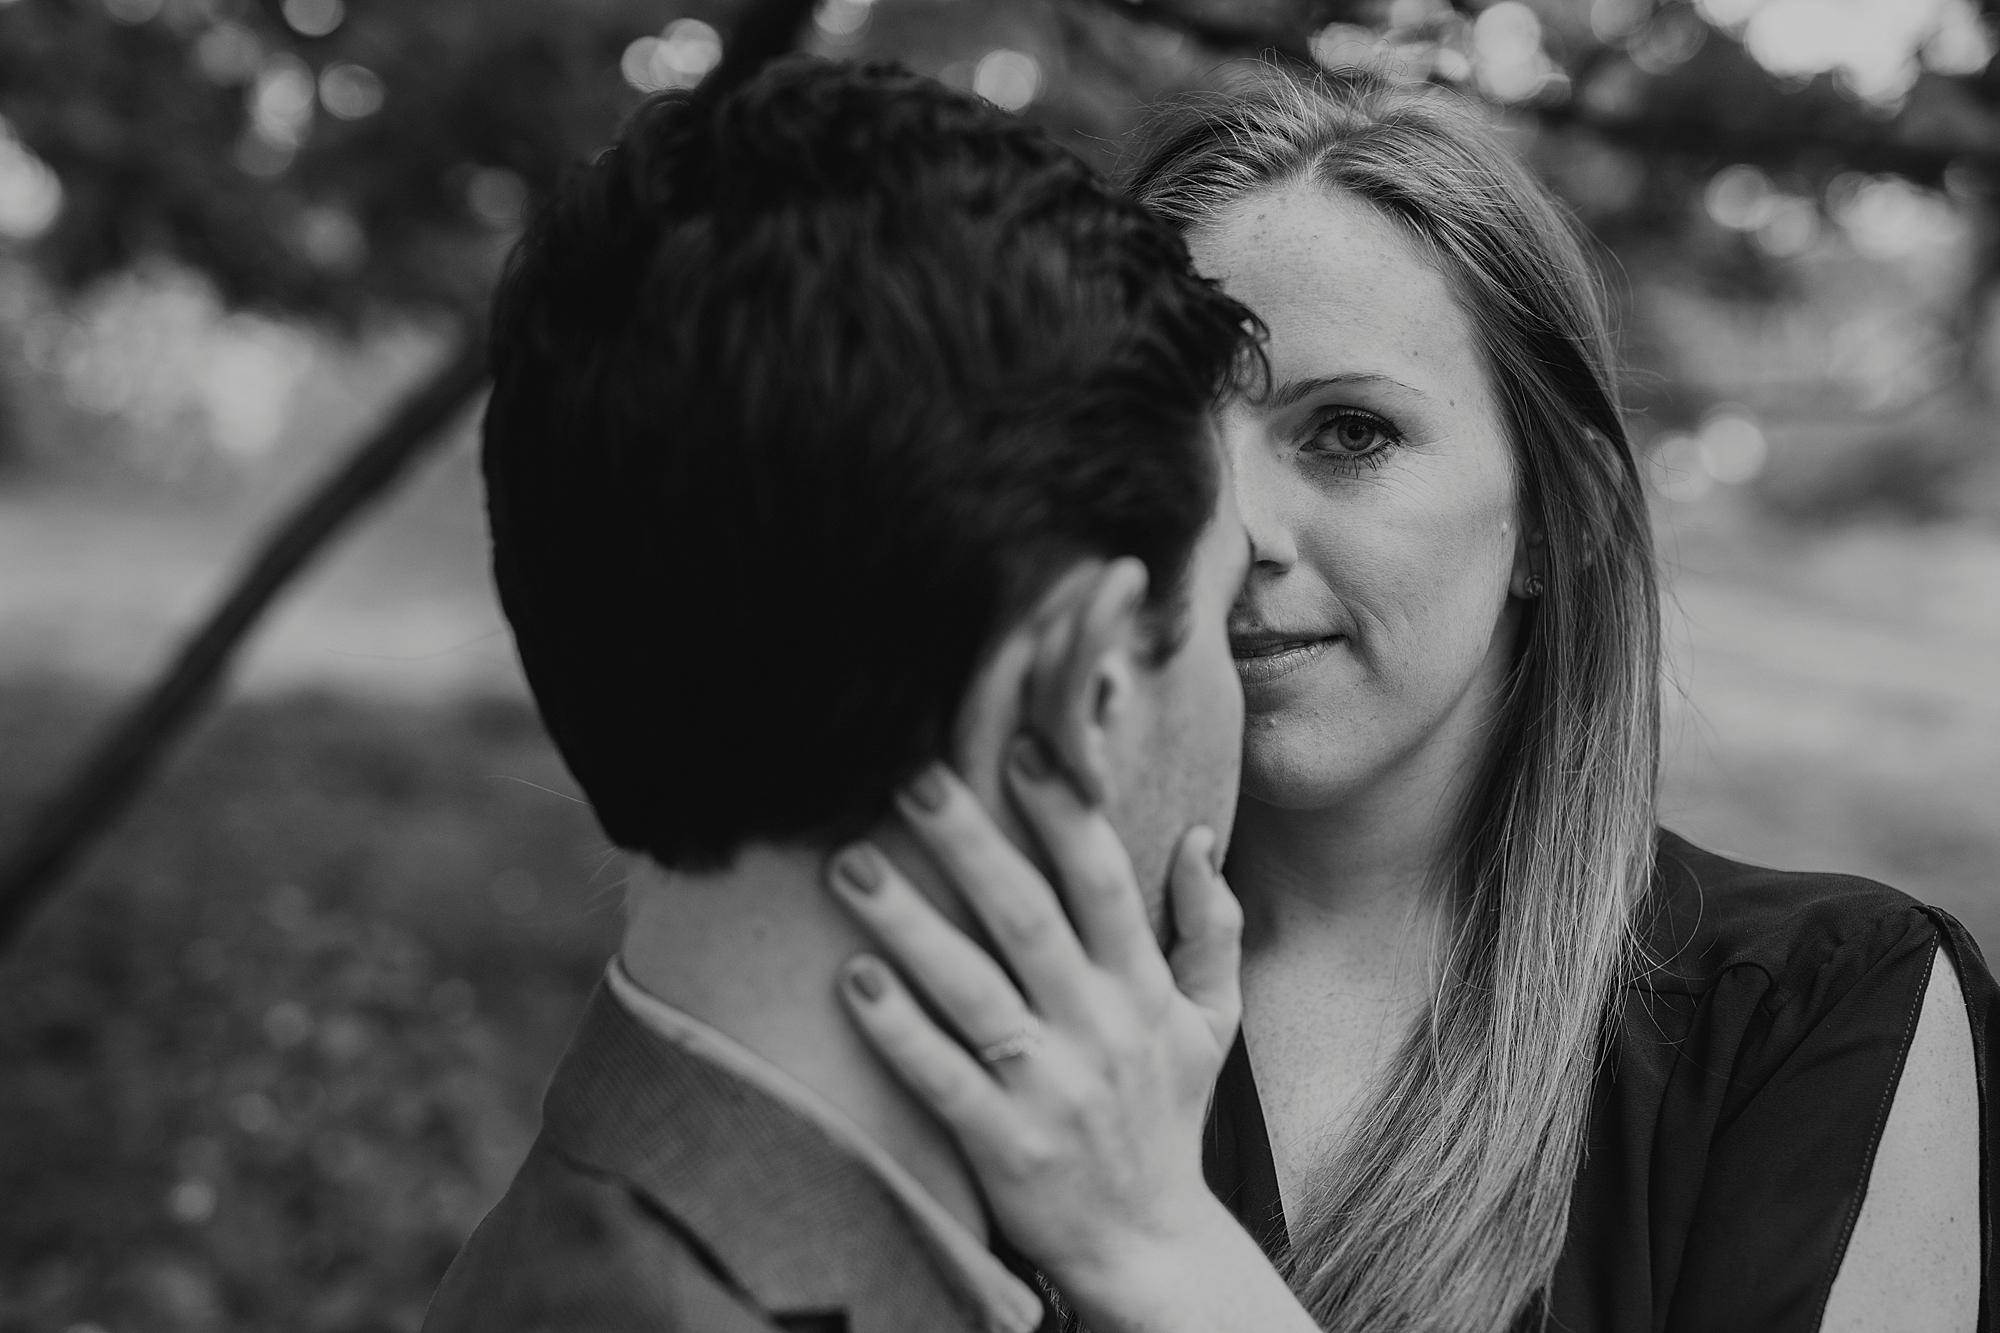 Tori_Zack_Glen_Mills_Terrain Cafe_Wedding_Engagement_Photography_Joe_Mac_Creative__0034.jpg